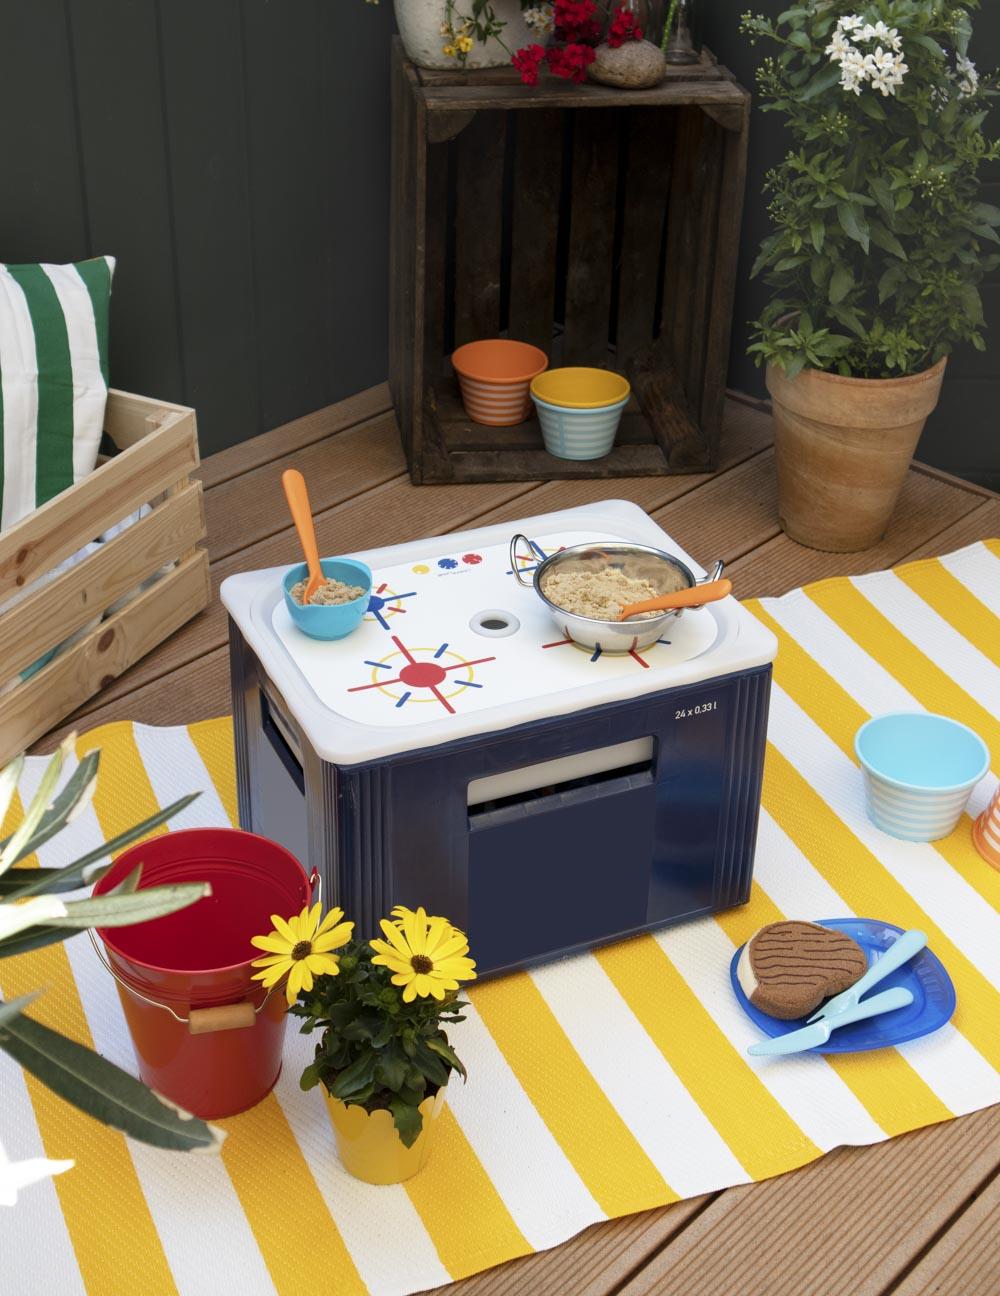 Ikea Trofast Box Kinderherd Erdig blau rot Gesamtansicht Getränkekiste